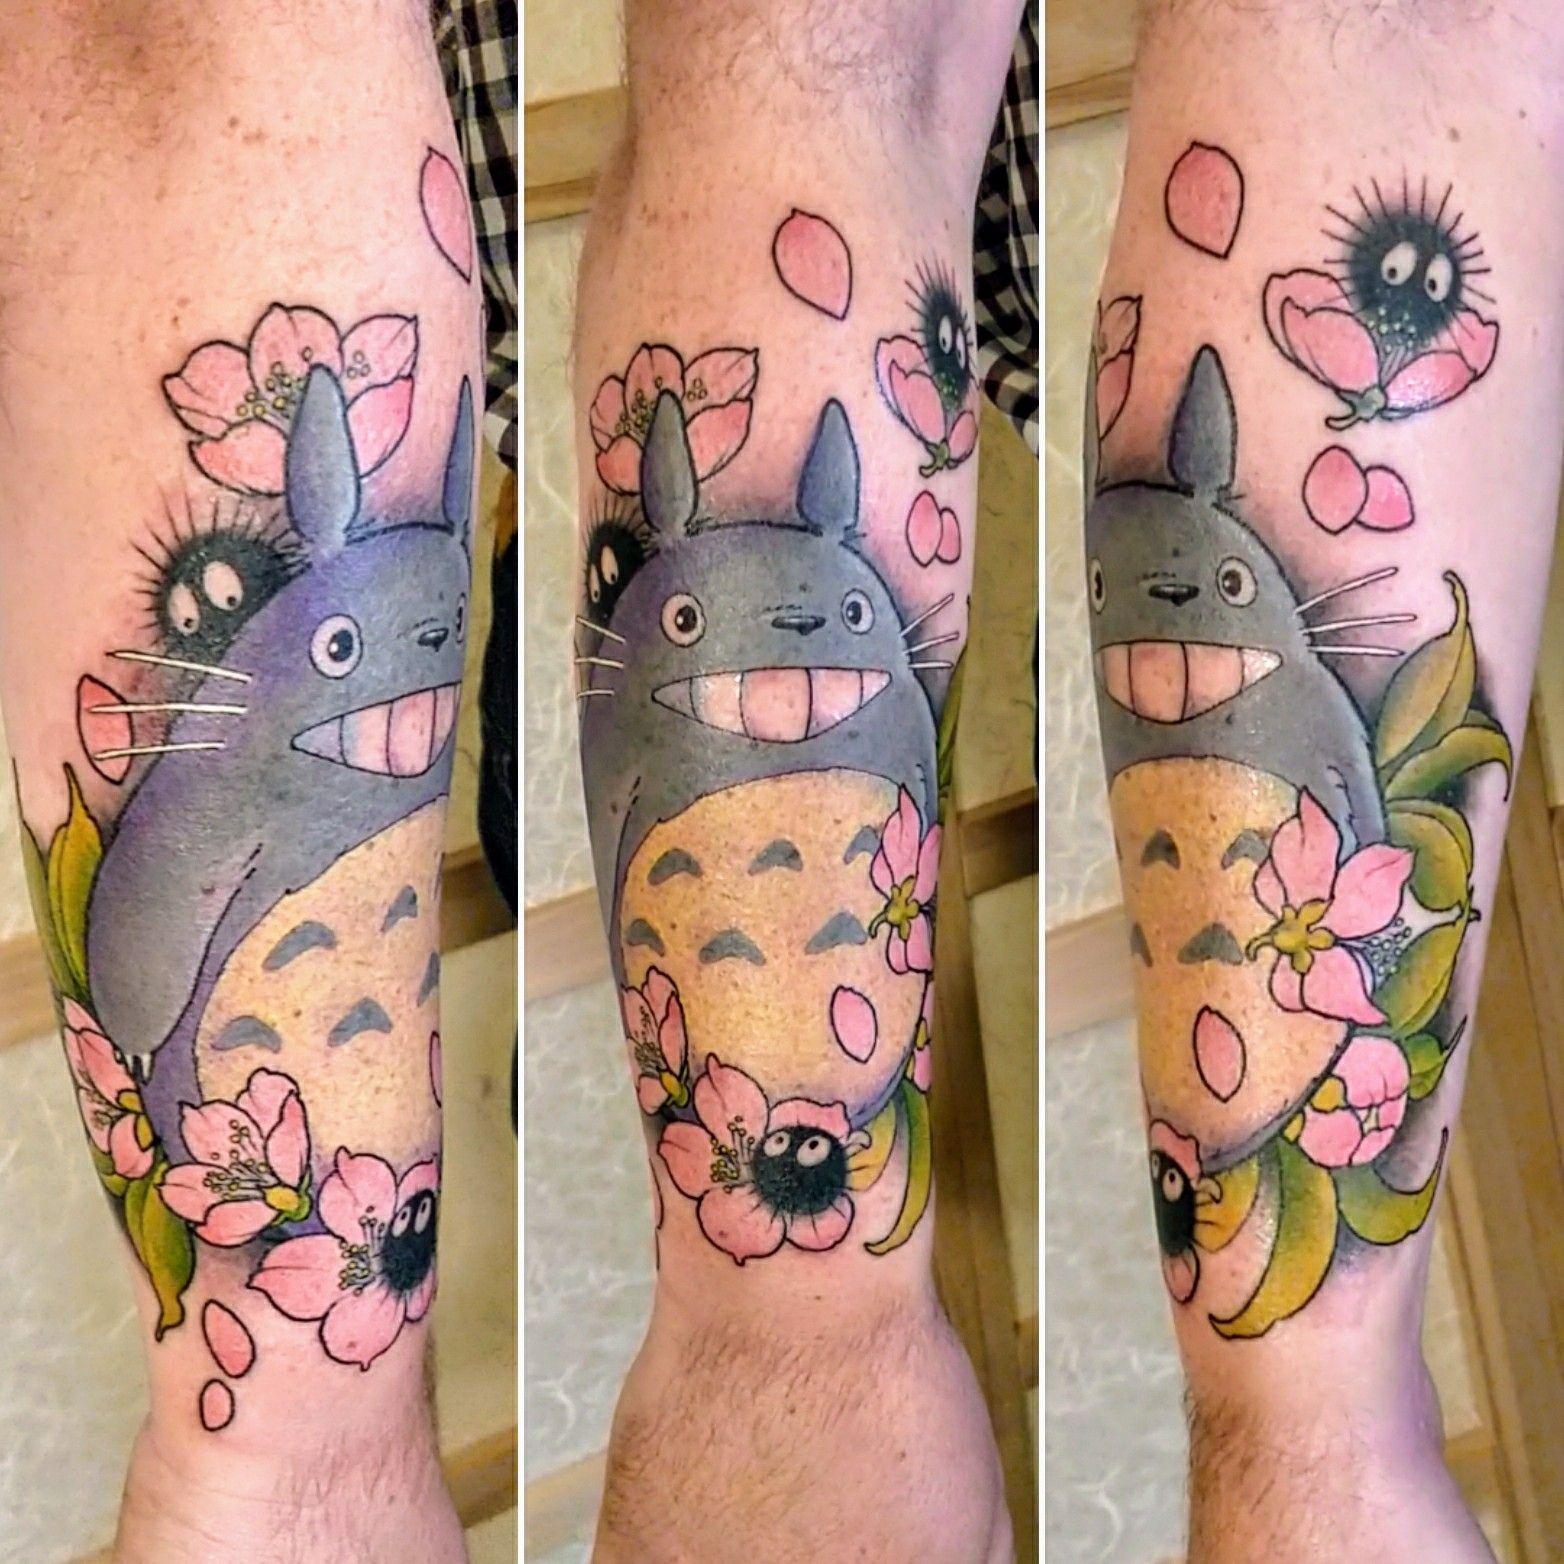 Ce tattoo Totoro est plein d'amour